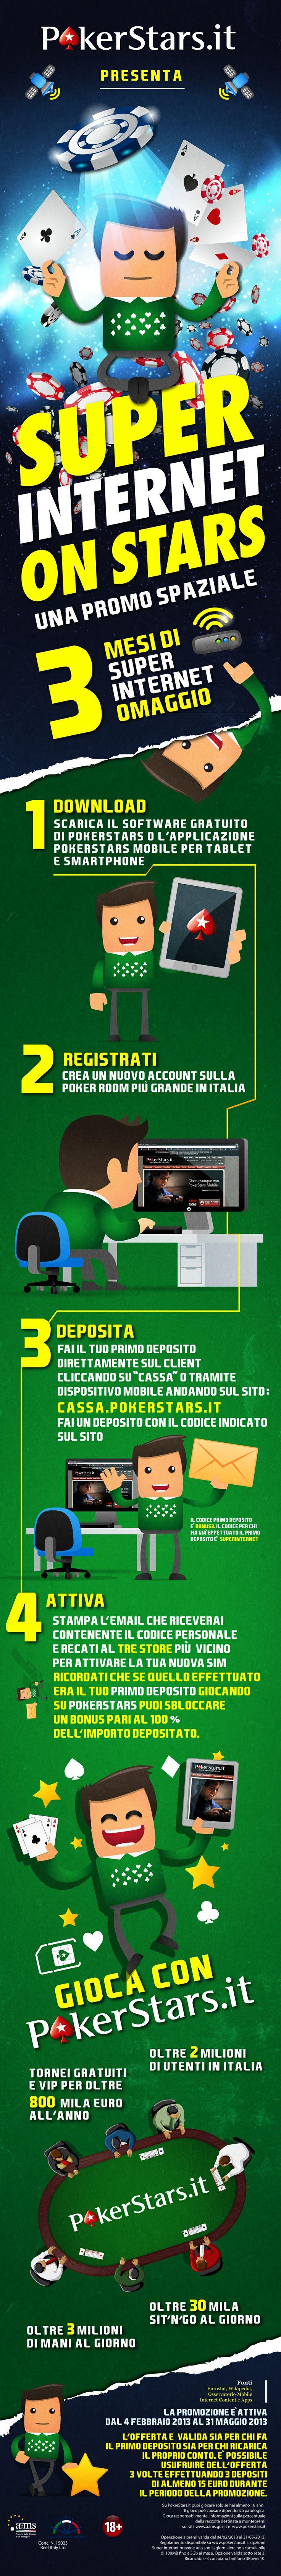 infografica Super Internet On Stars - promozione pokerstars.it